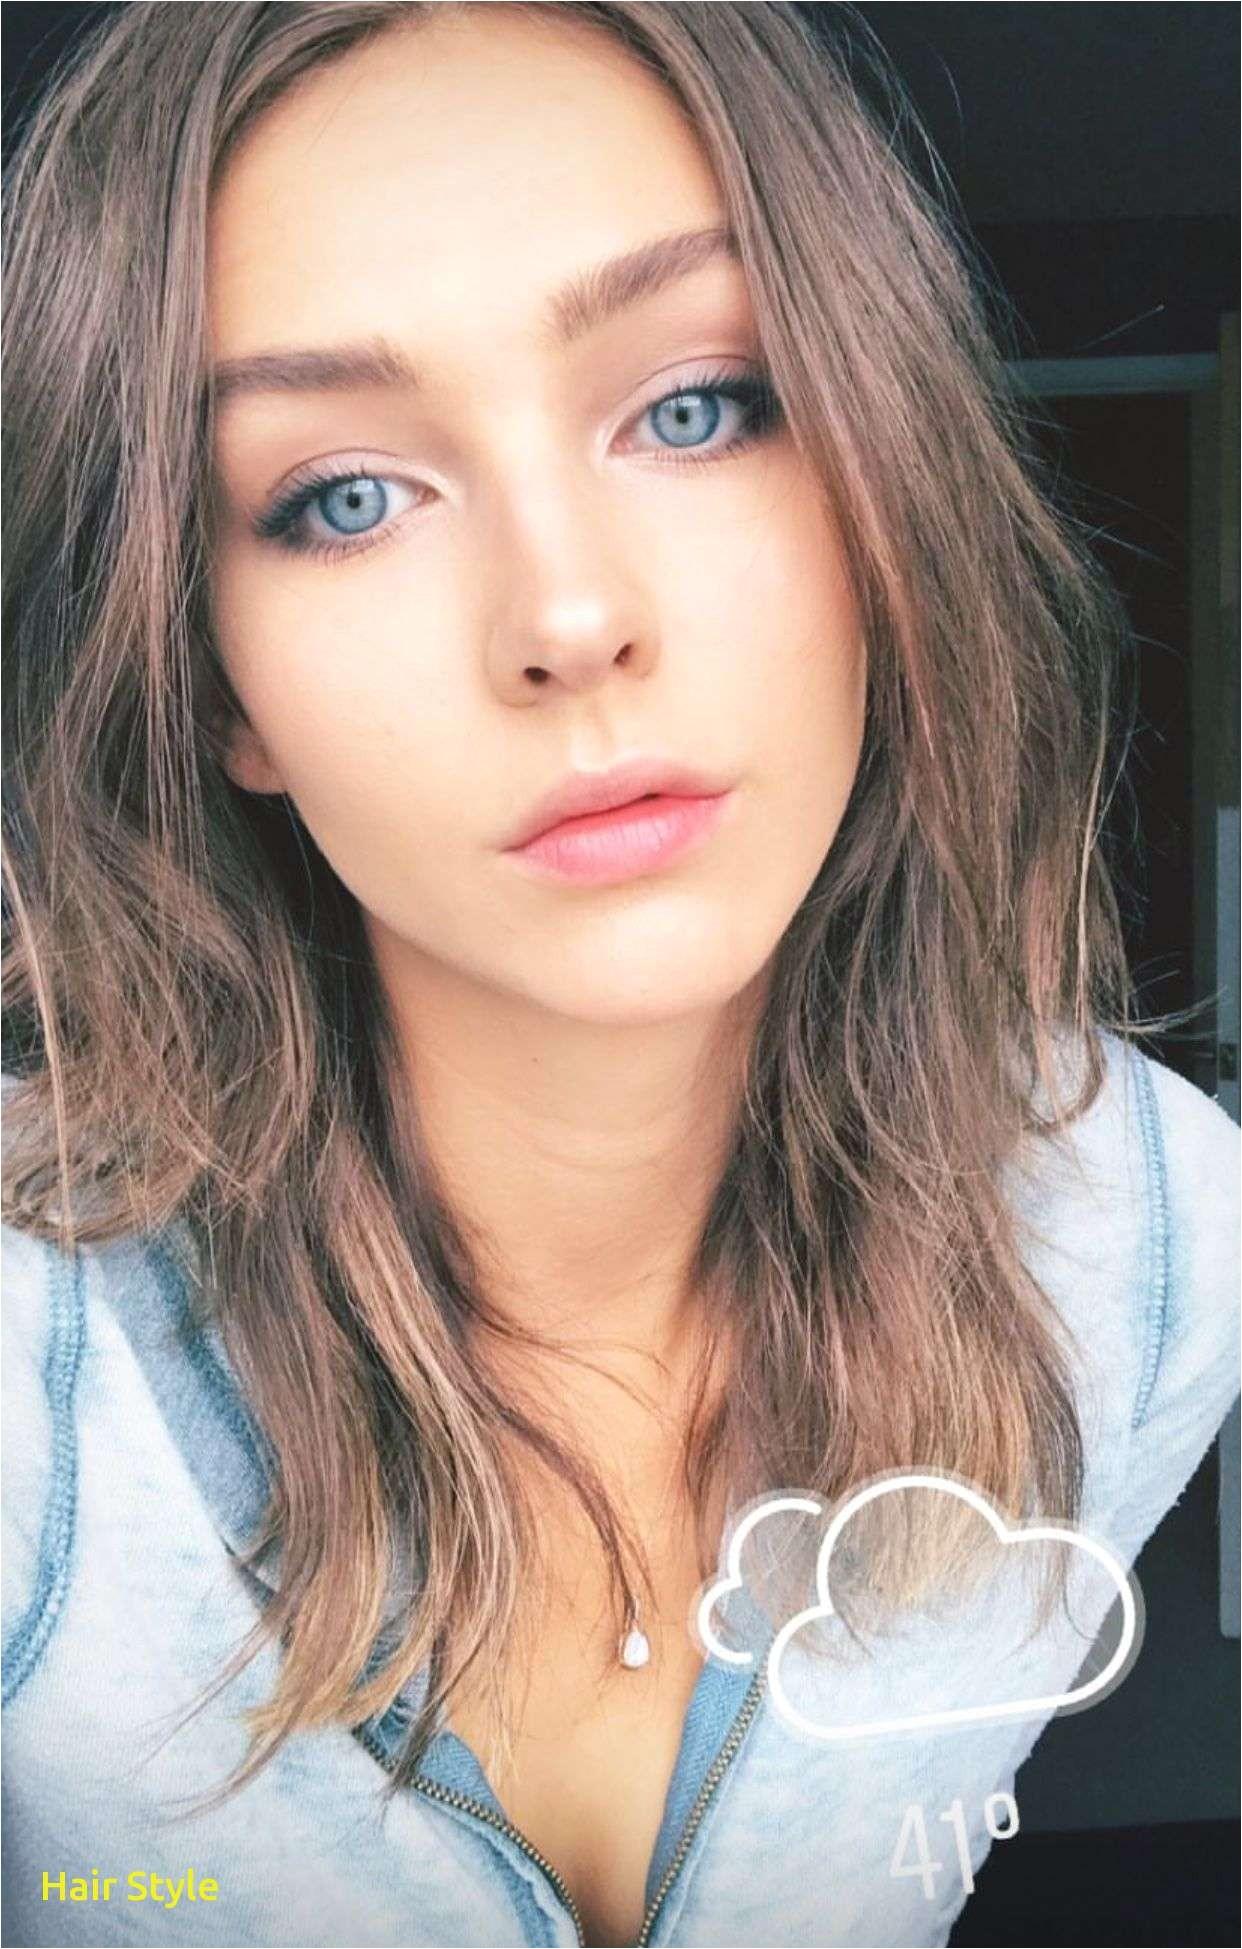 Bad Girl Hairstyles Fresh Pin by 503 703 Bad Girls Pinterest Beautiful Models Selfies